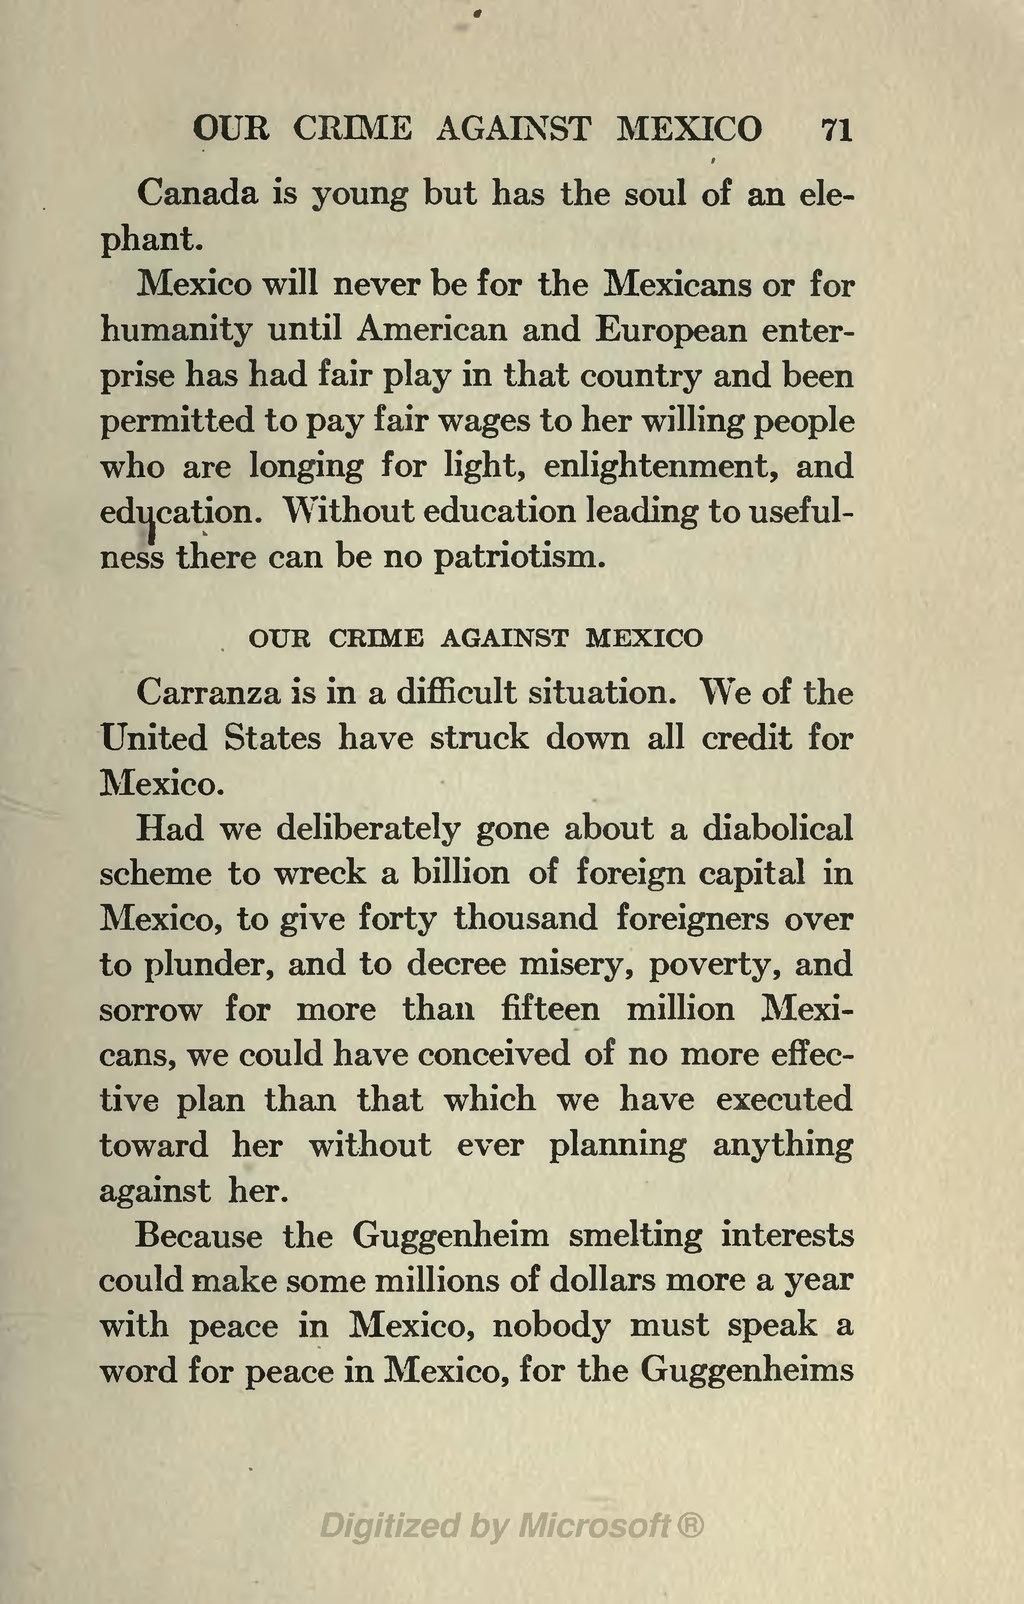 Mexican problem through 1917 essay